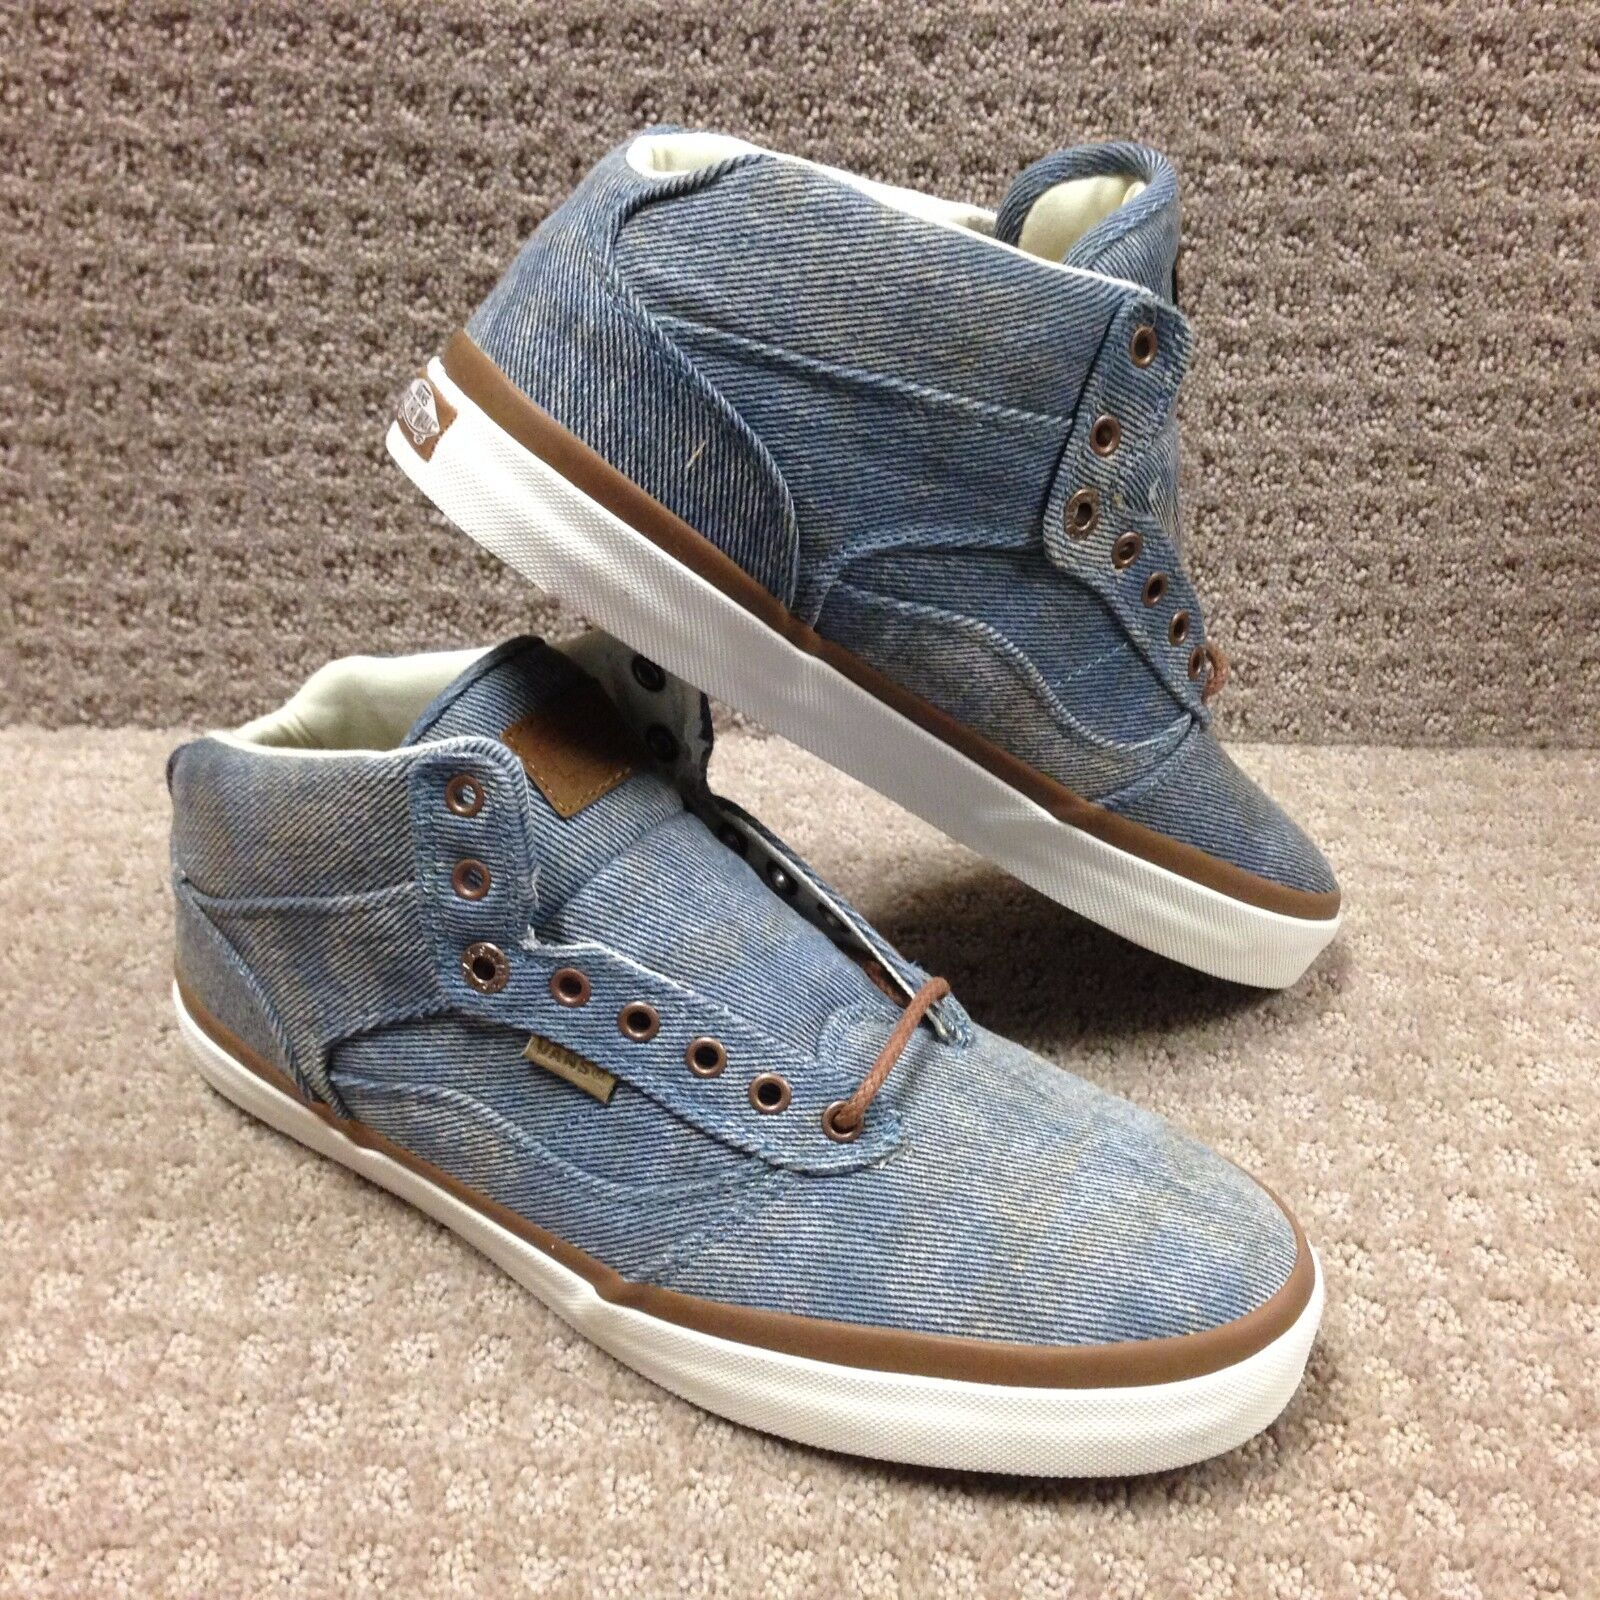 Vans Men's shoes  Bedford +   (Acid Denim) bluee